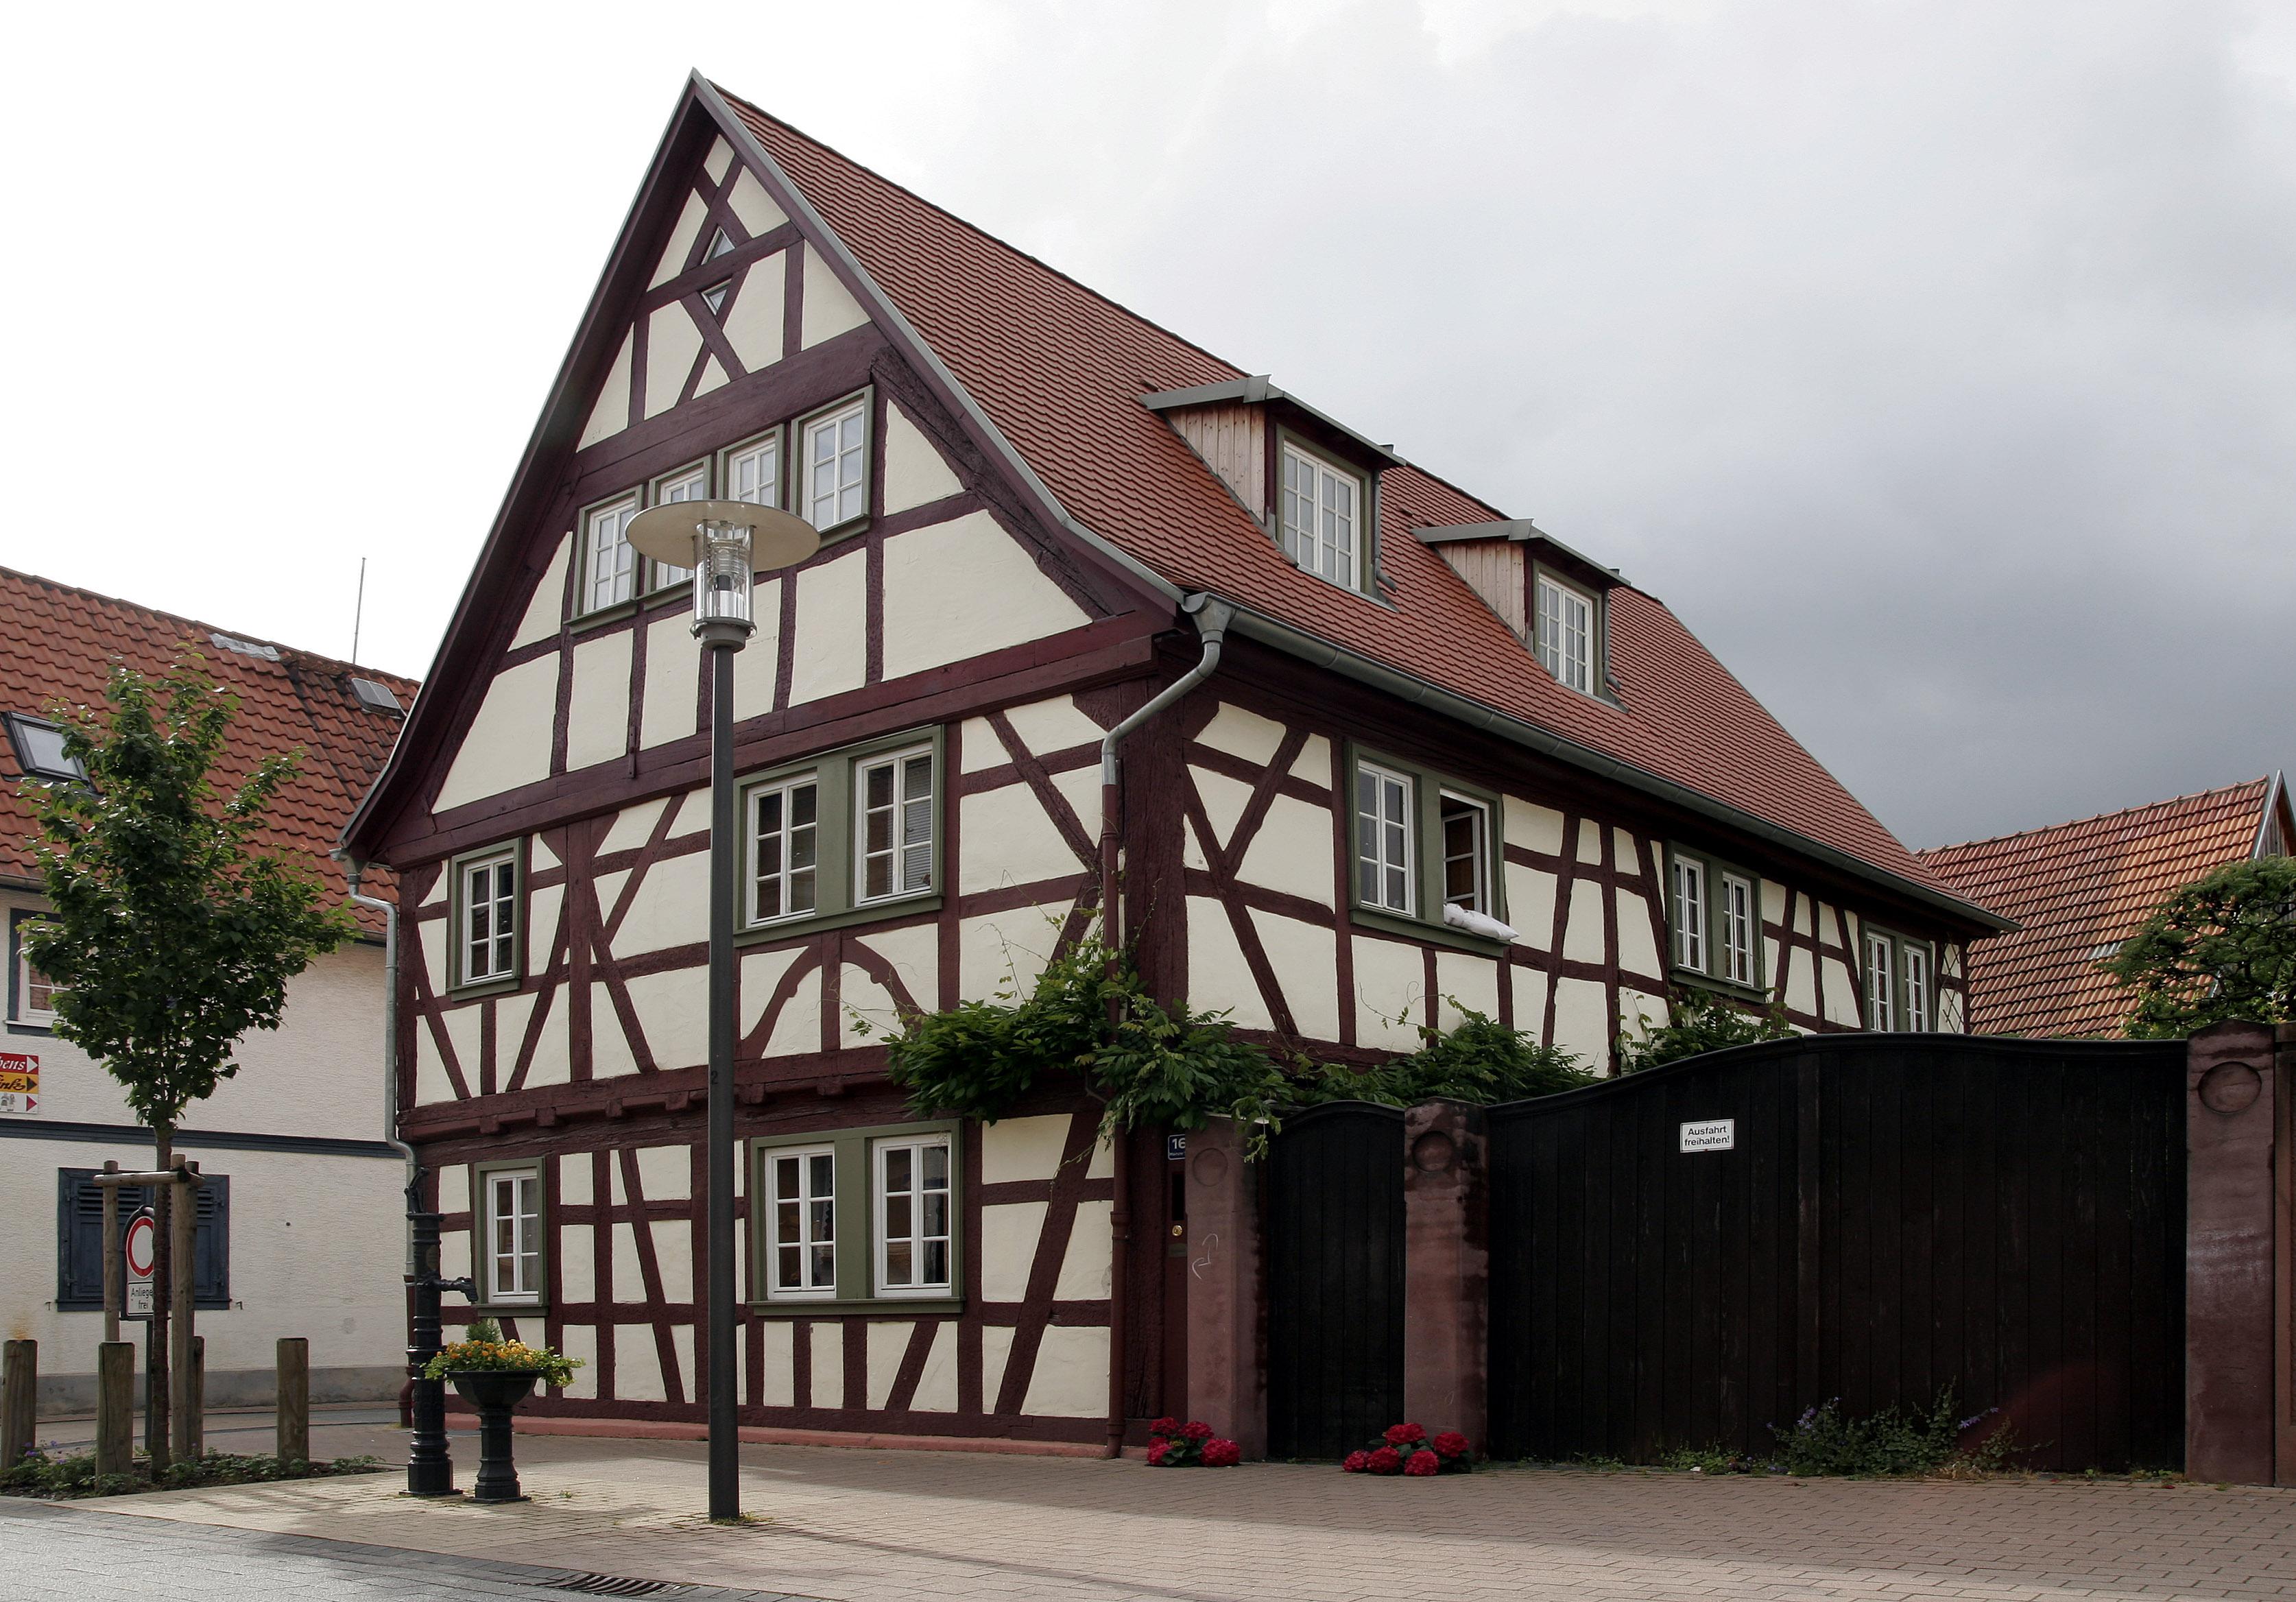 Gross-Gerau Germany  city pictures gallery : Gross Gerau Fachwerk 05 Wikimedia Commons